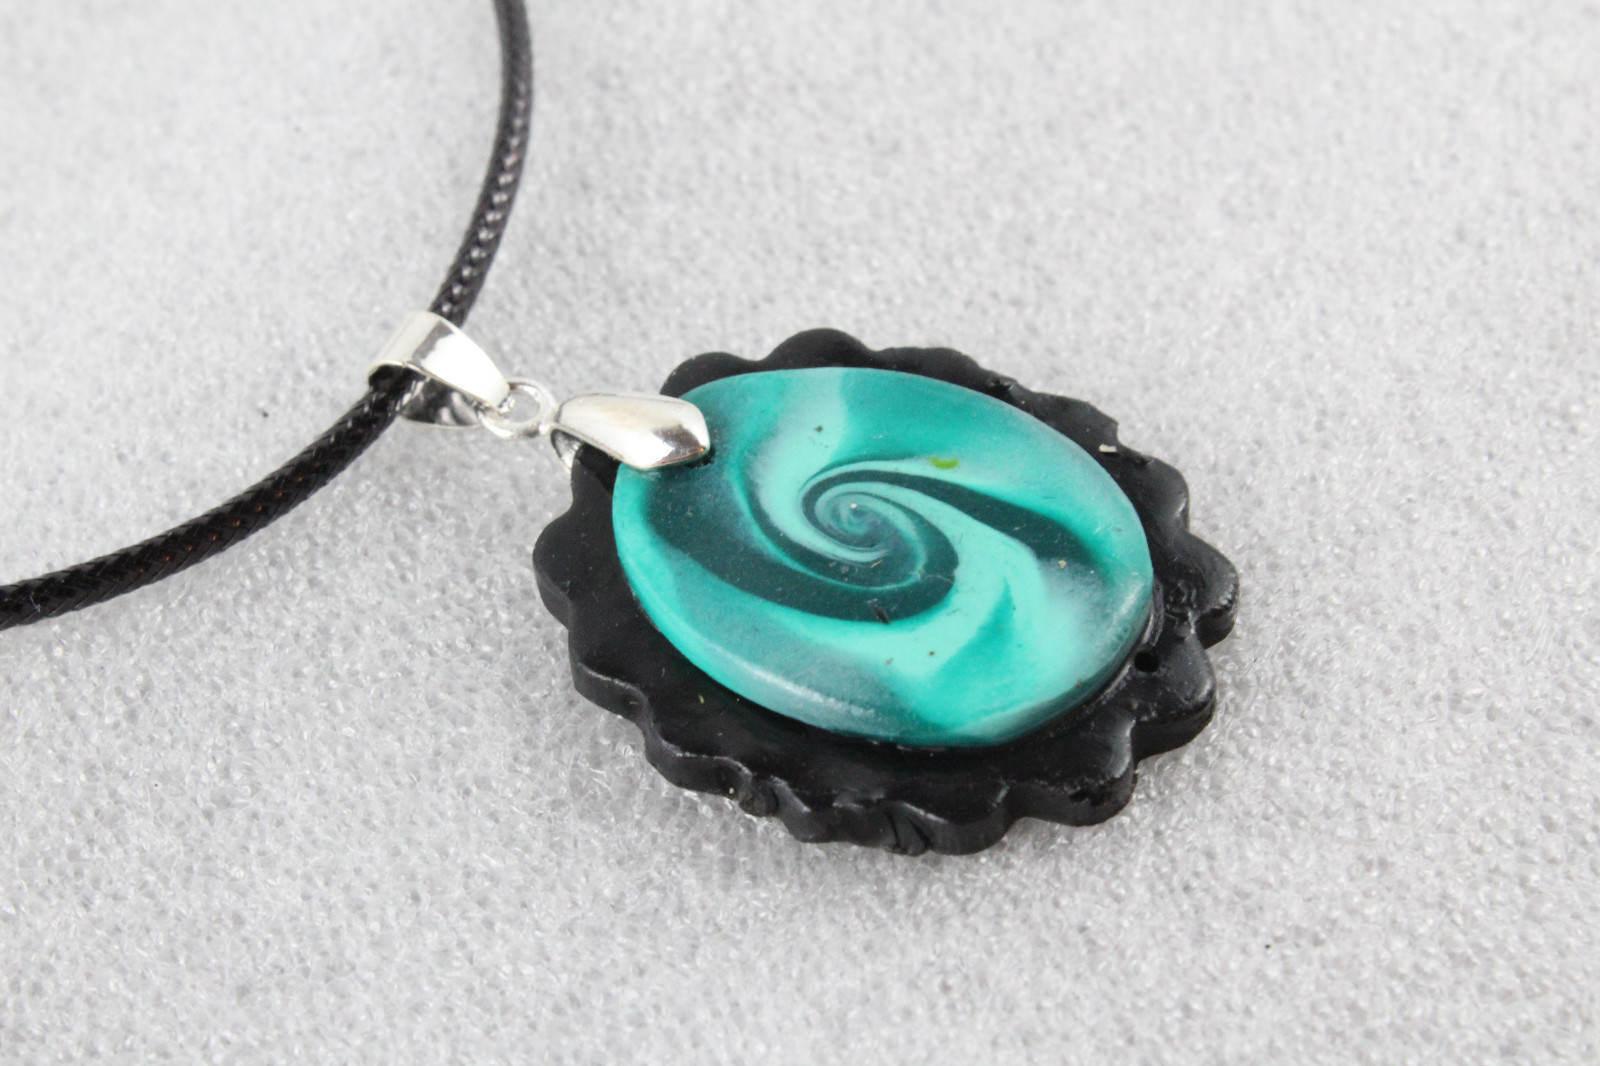 Elegant Handmade Premo Clay Pendant Necklace + Cord #EM016